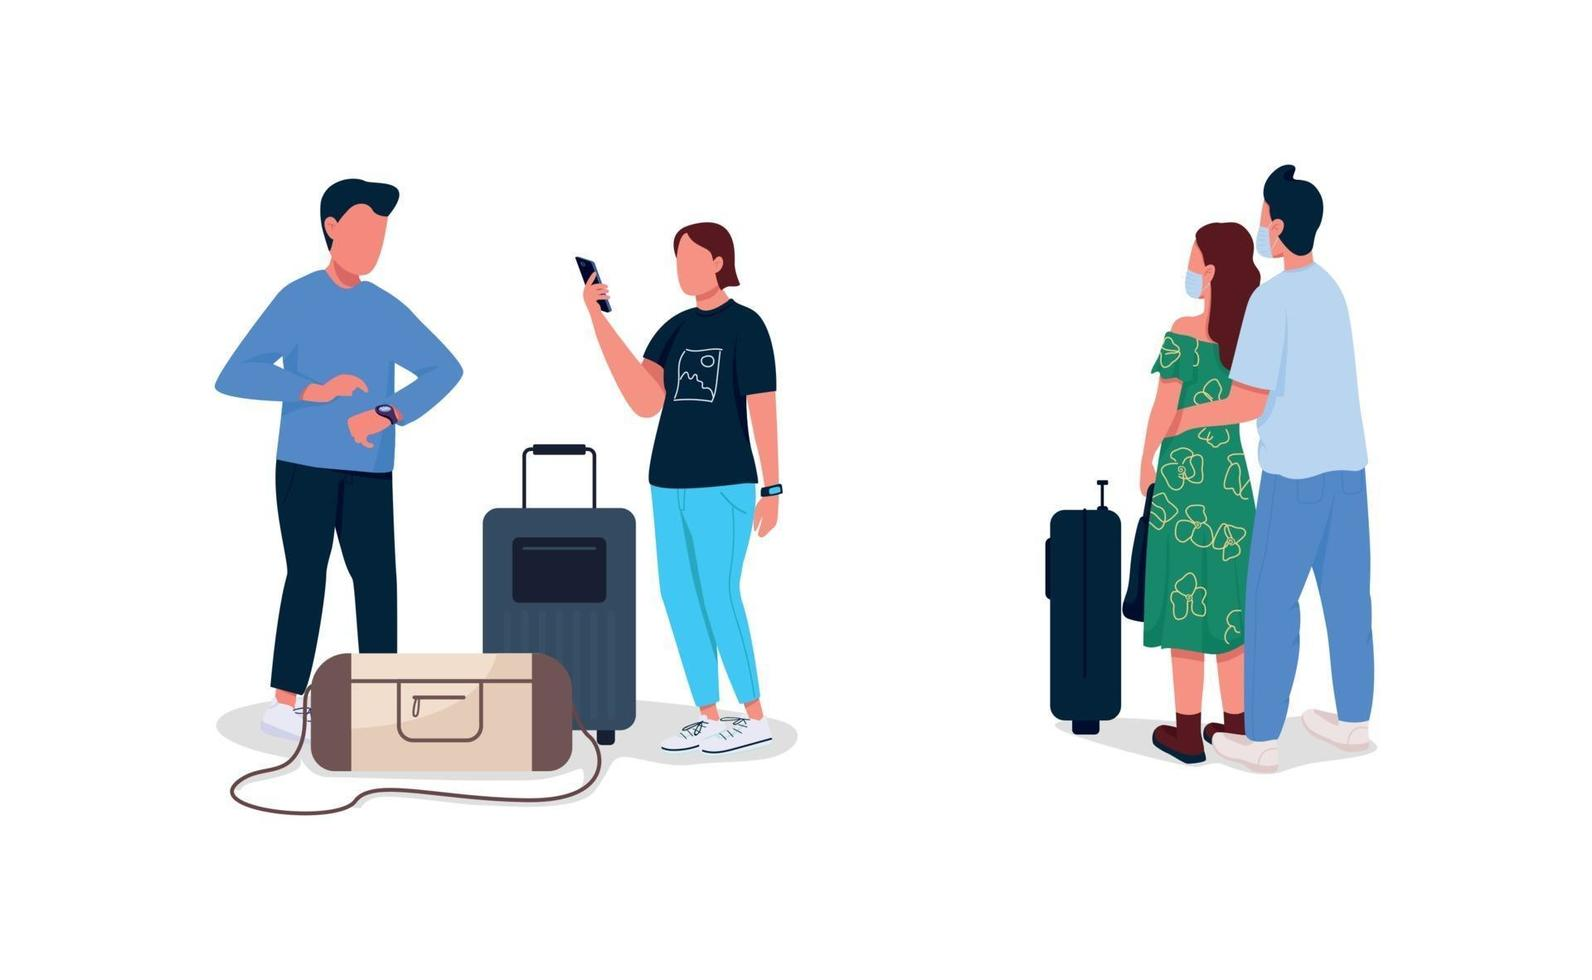 vliegtuigpassagiers egale kleur vector anonieme tekenset